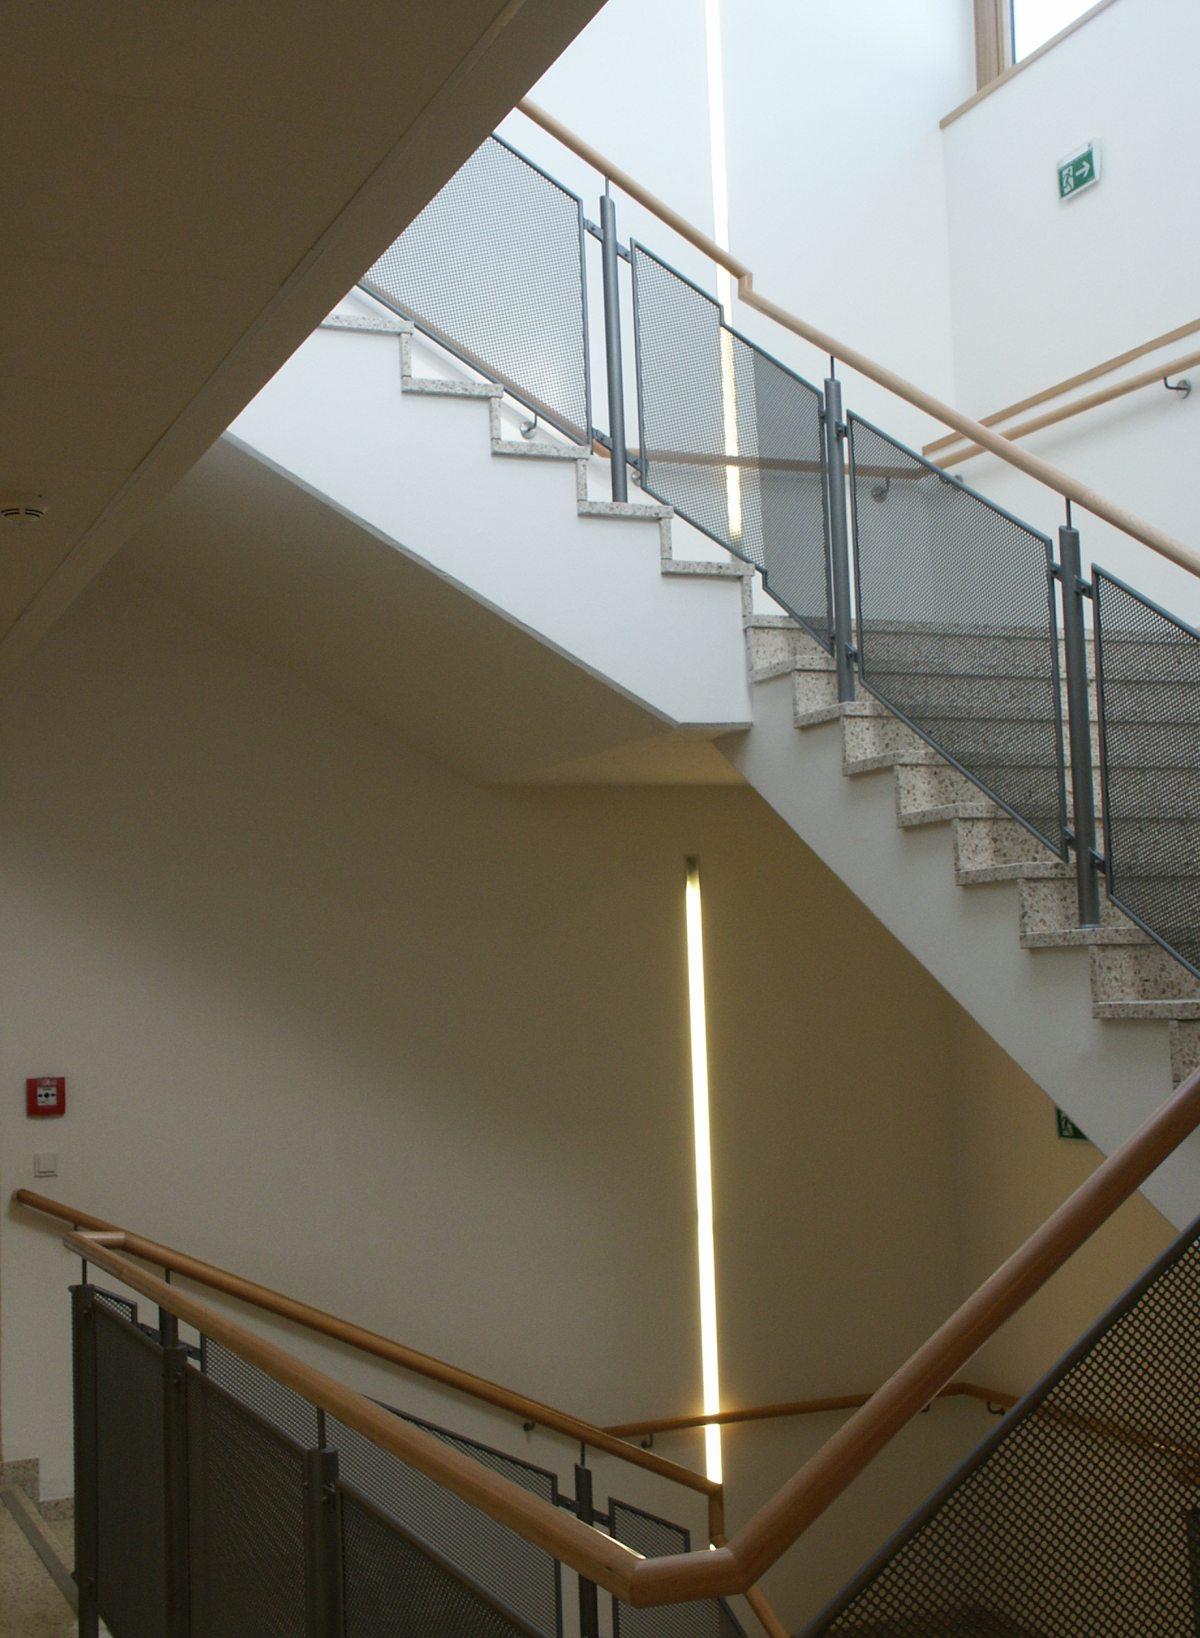 Beleuchtung Im Treppenhaus fuma led ms profil serie